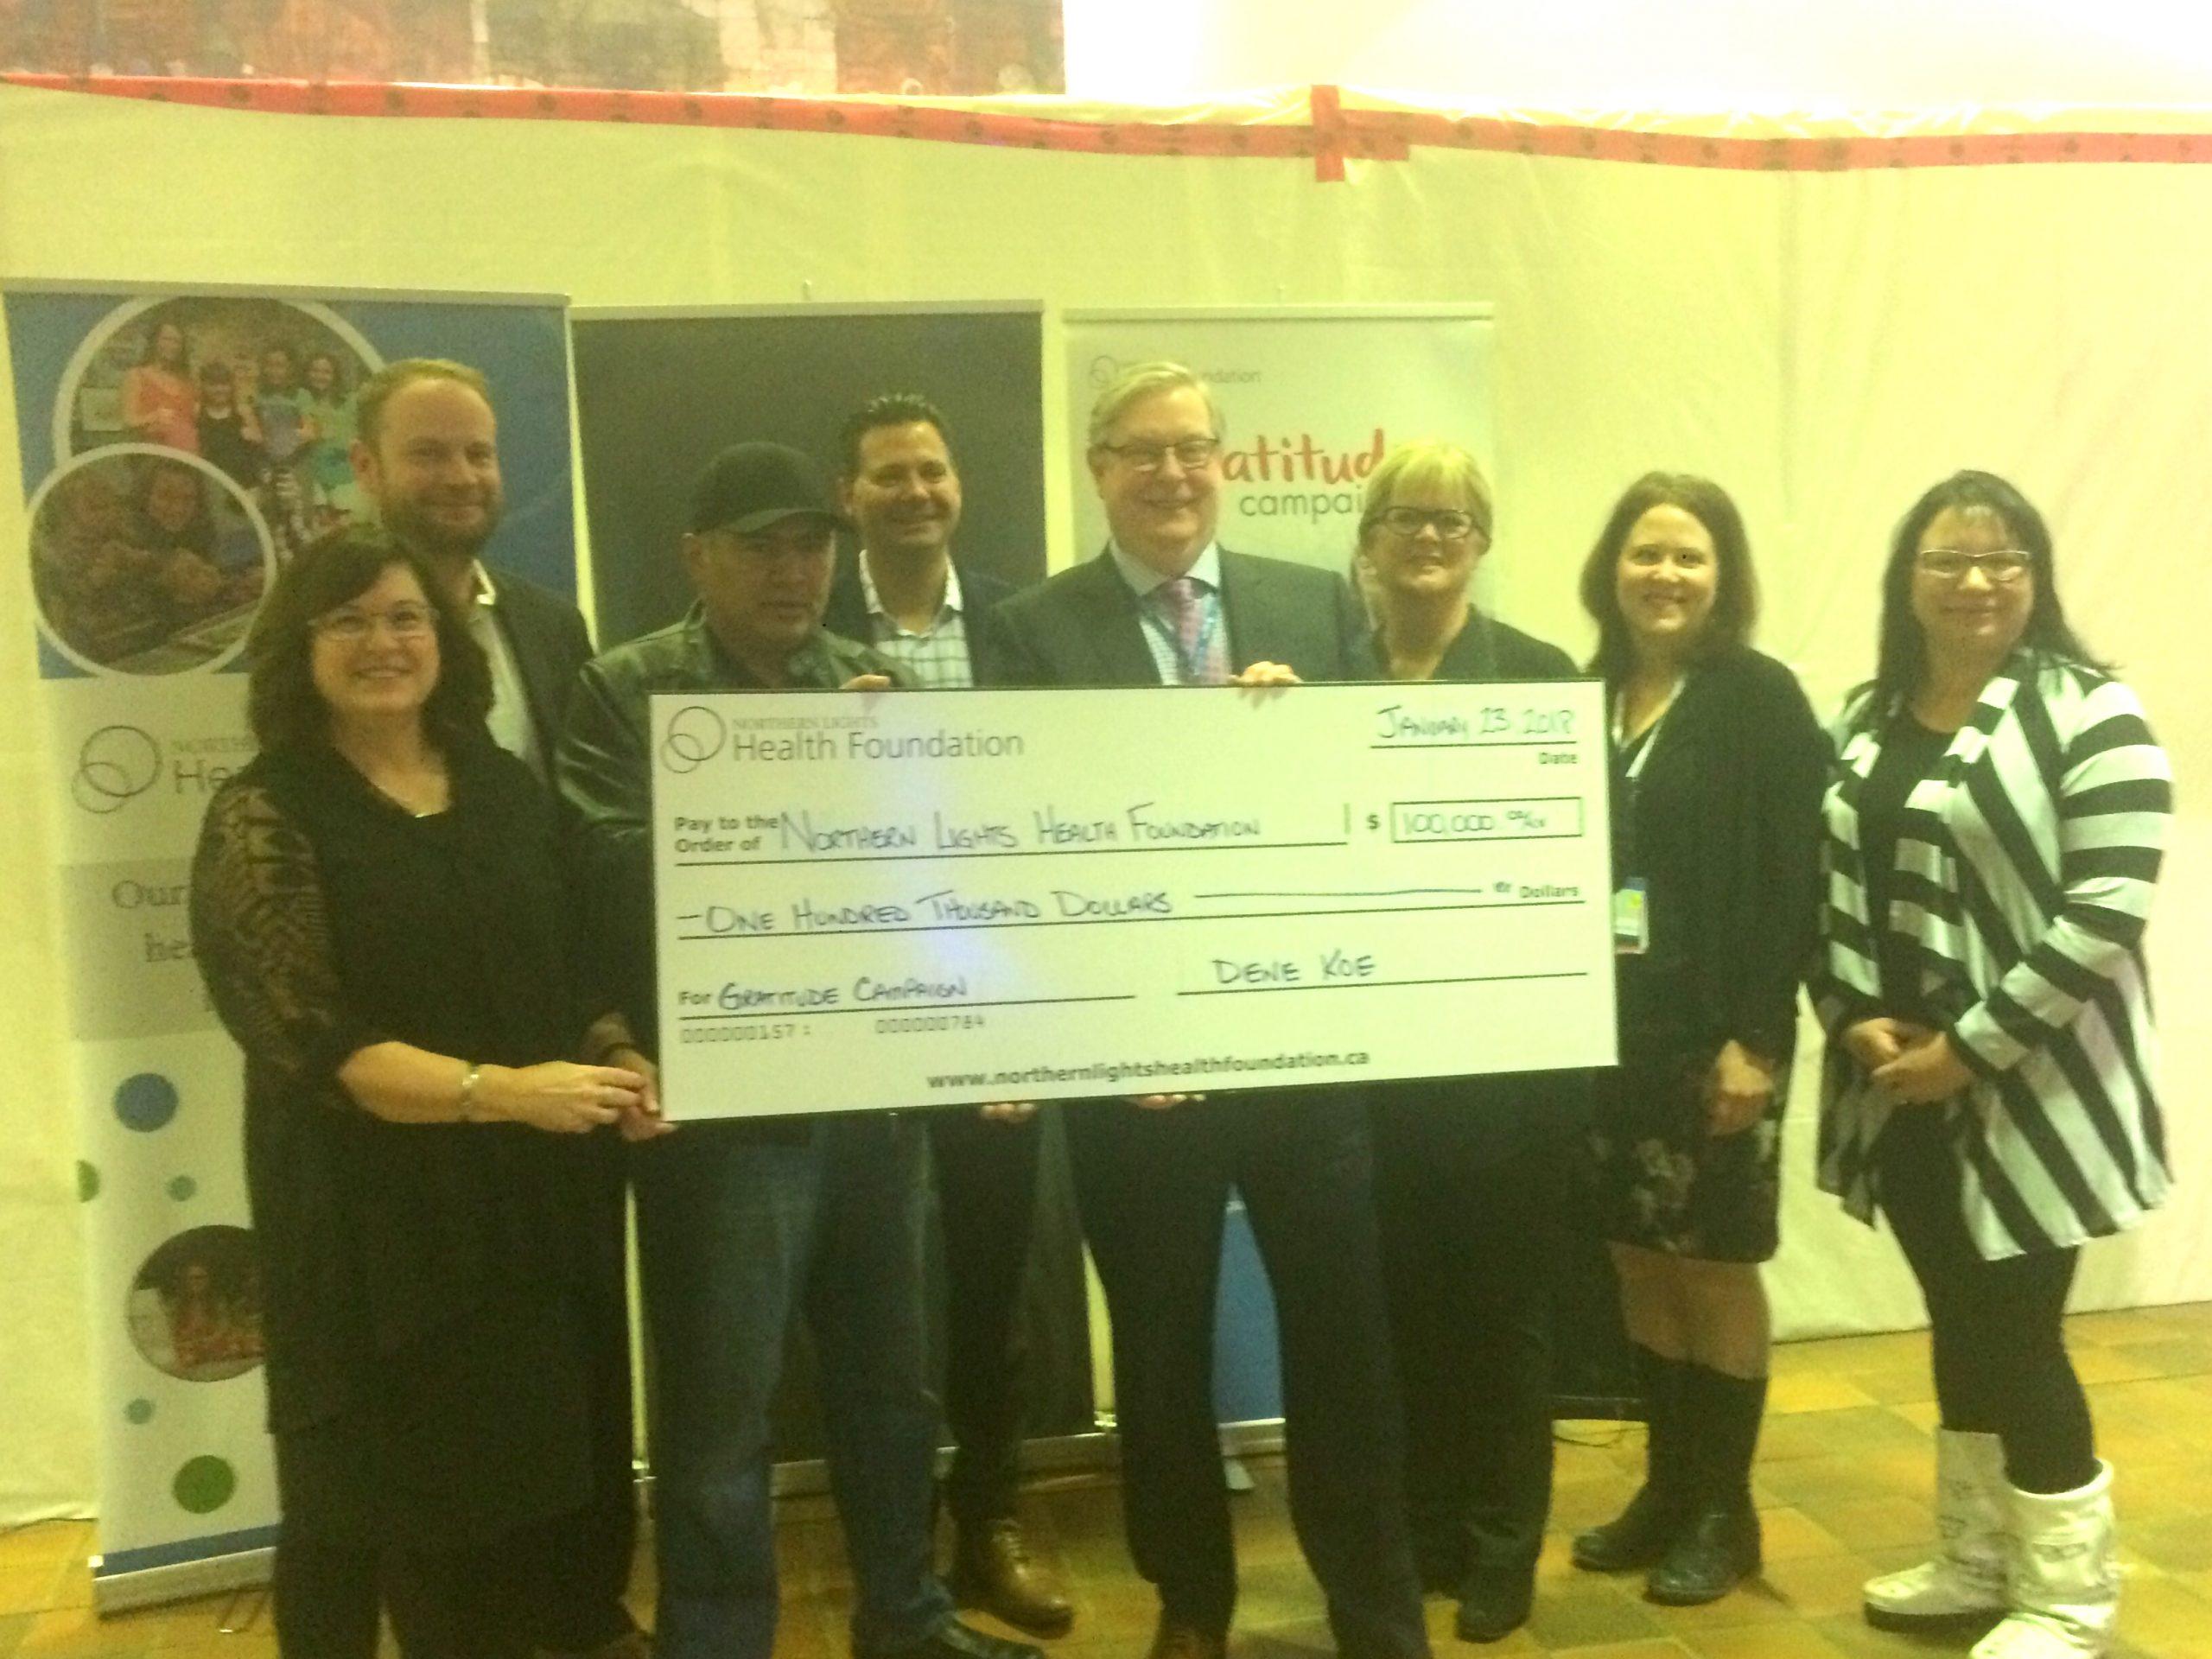 Dene Koe Donates $100k To Health Foundation's Gratitude Campaign